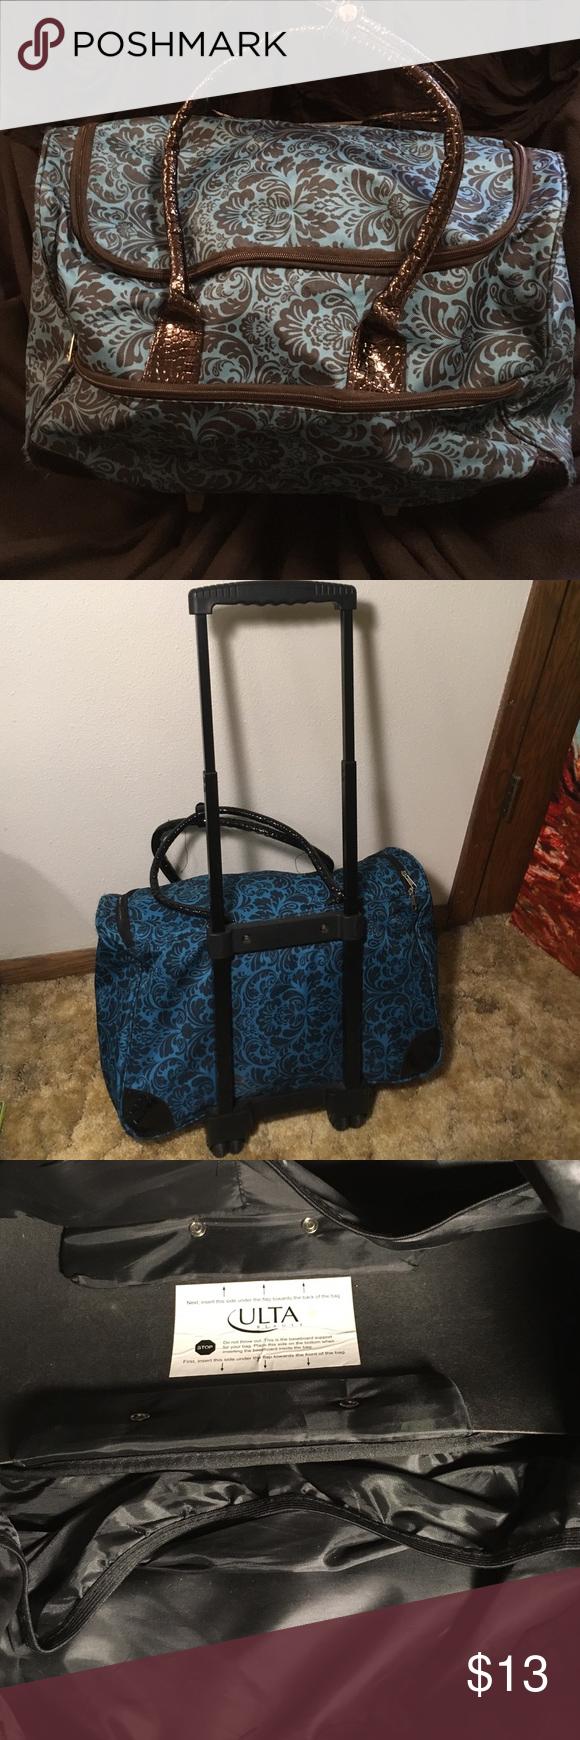 Teal weekend bag Cary on sized weekend bag with wheels. Mild wear. Ulta Bags Travel Bags